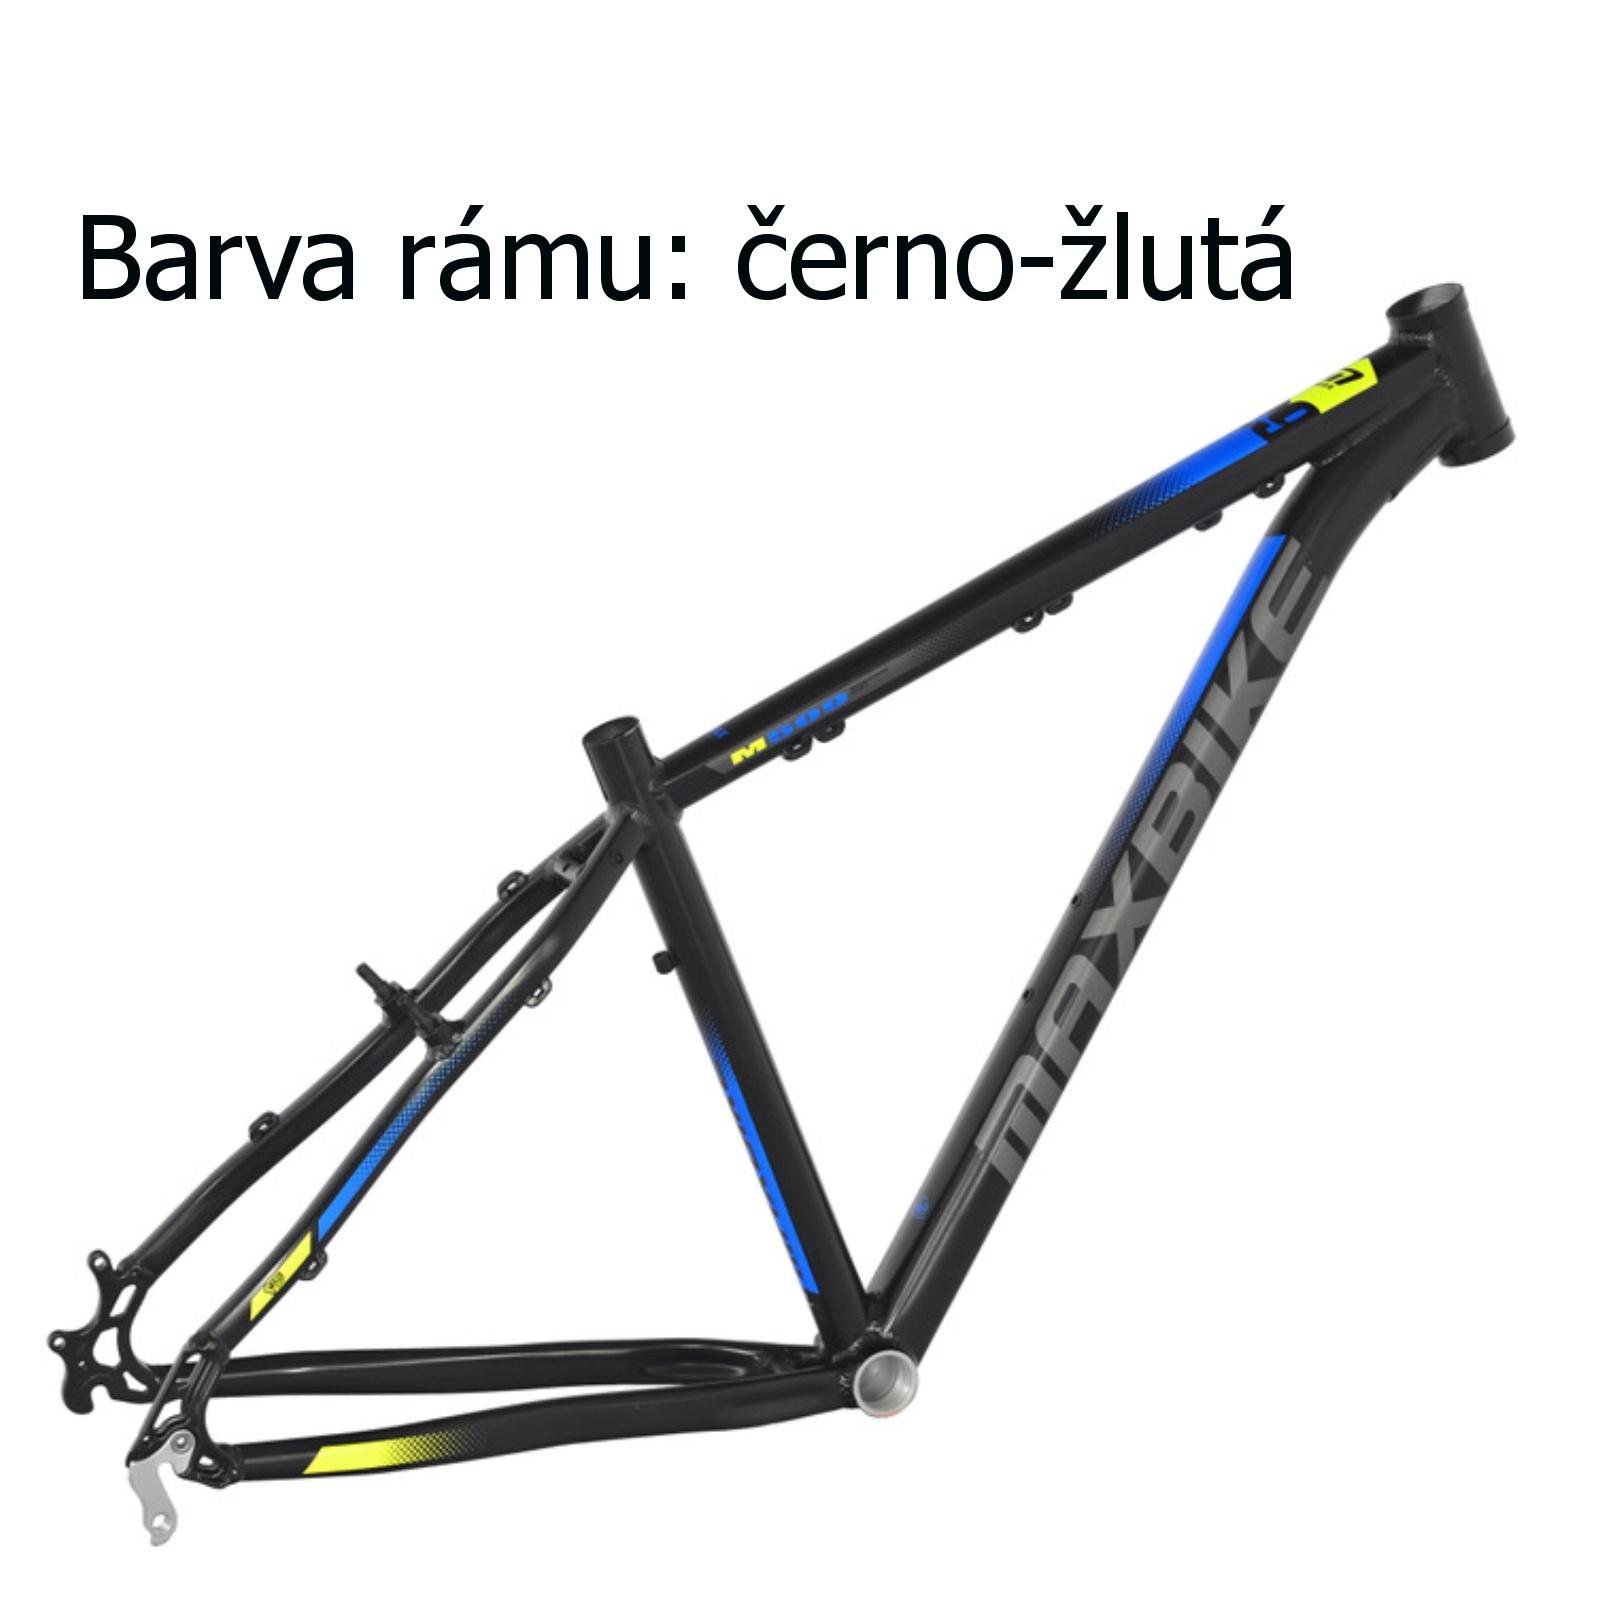 "Horské kolo MAXBIKE Apo 29 černo-žluté - vel. rámu 17"""